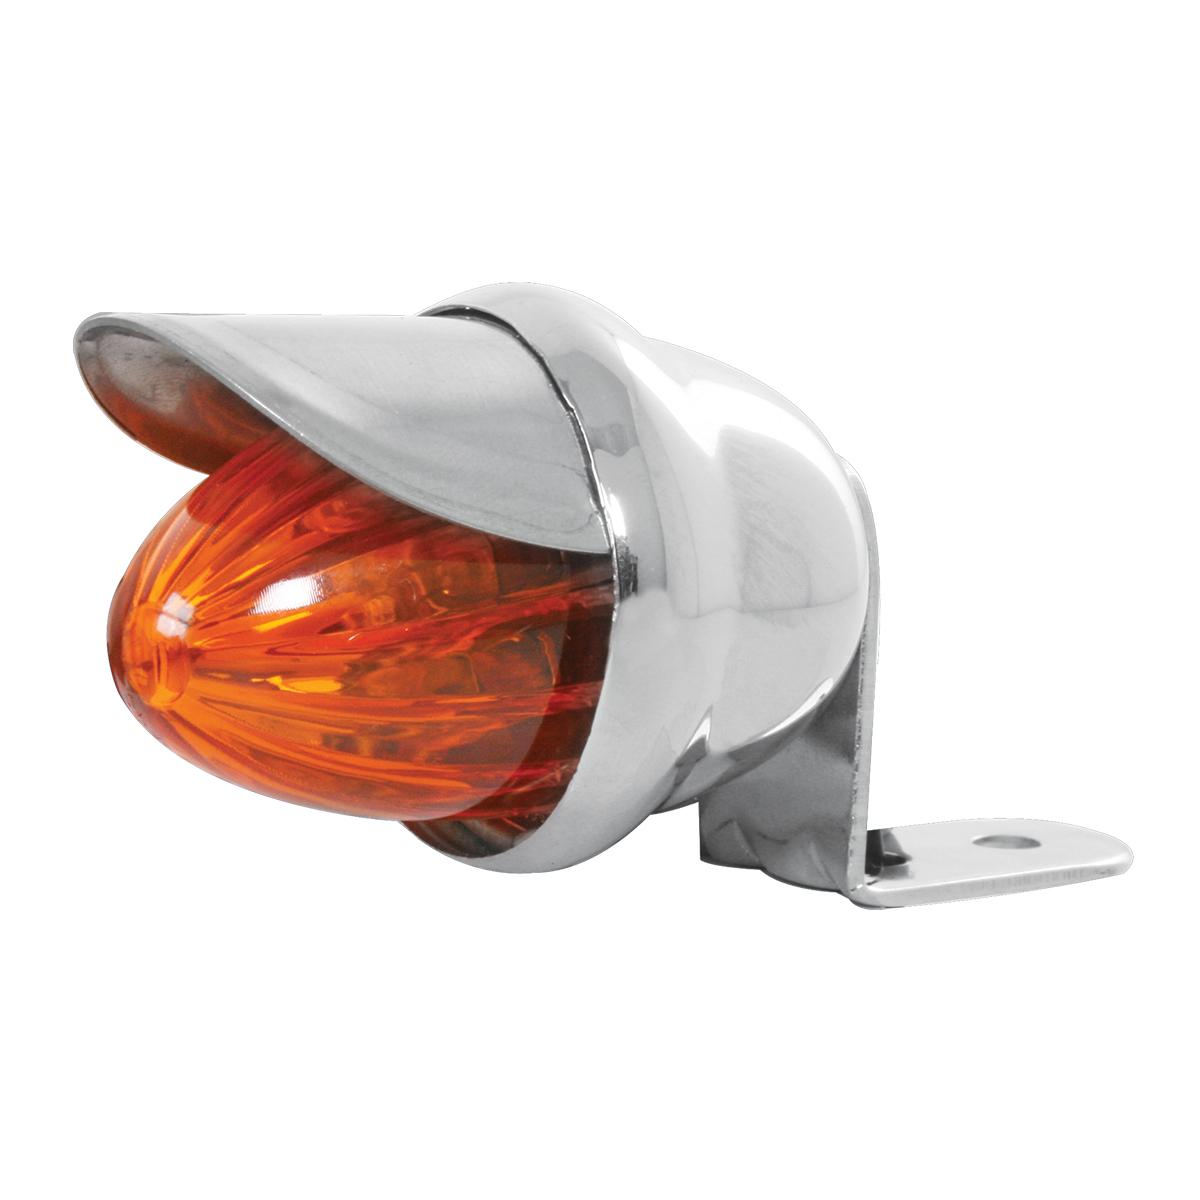 #82770 Mini Amber Marker & Clearance Single Light